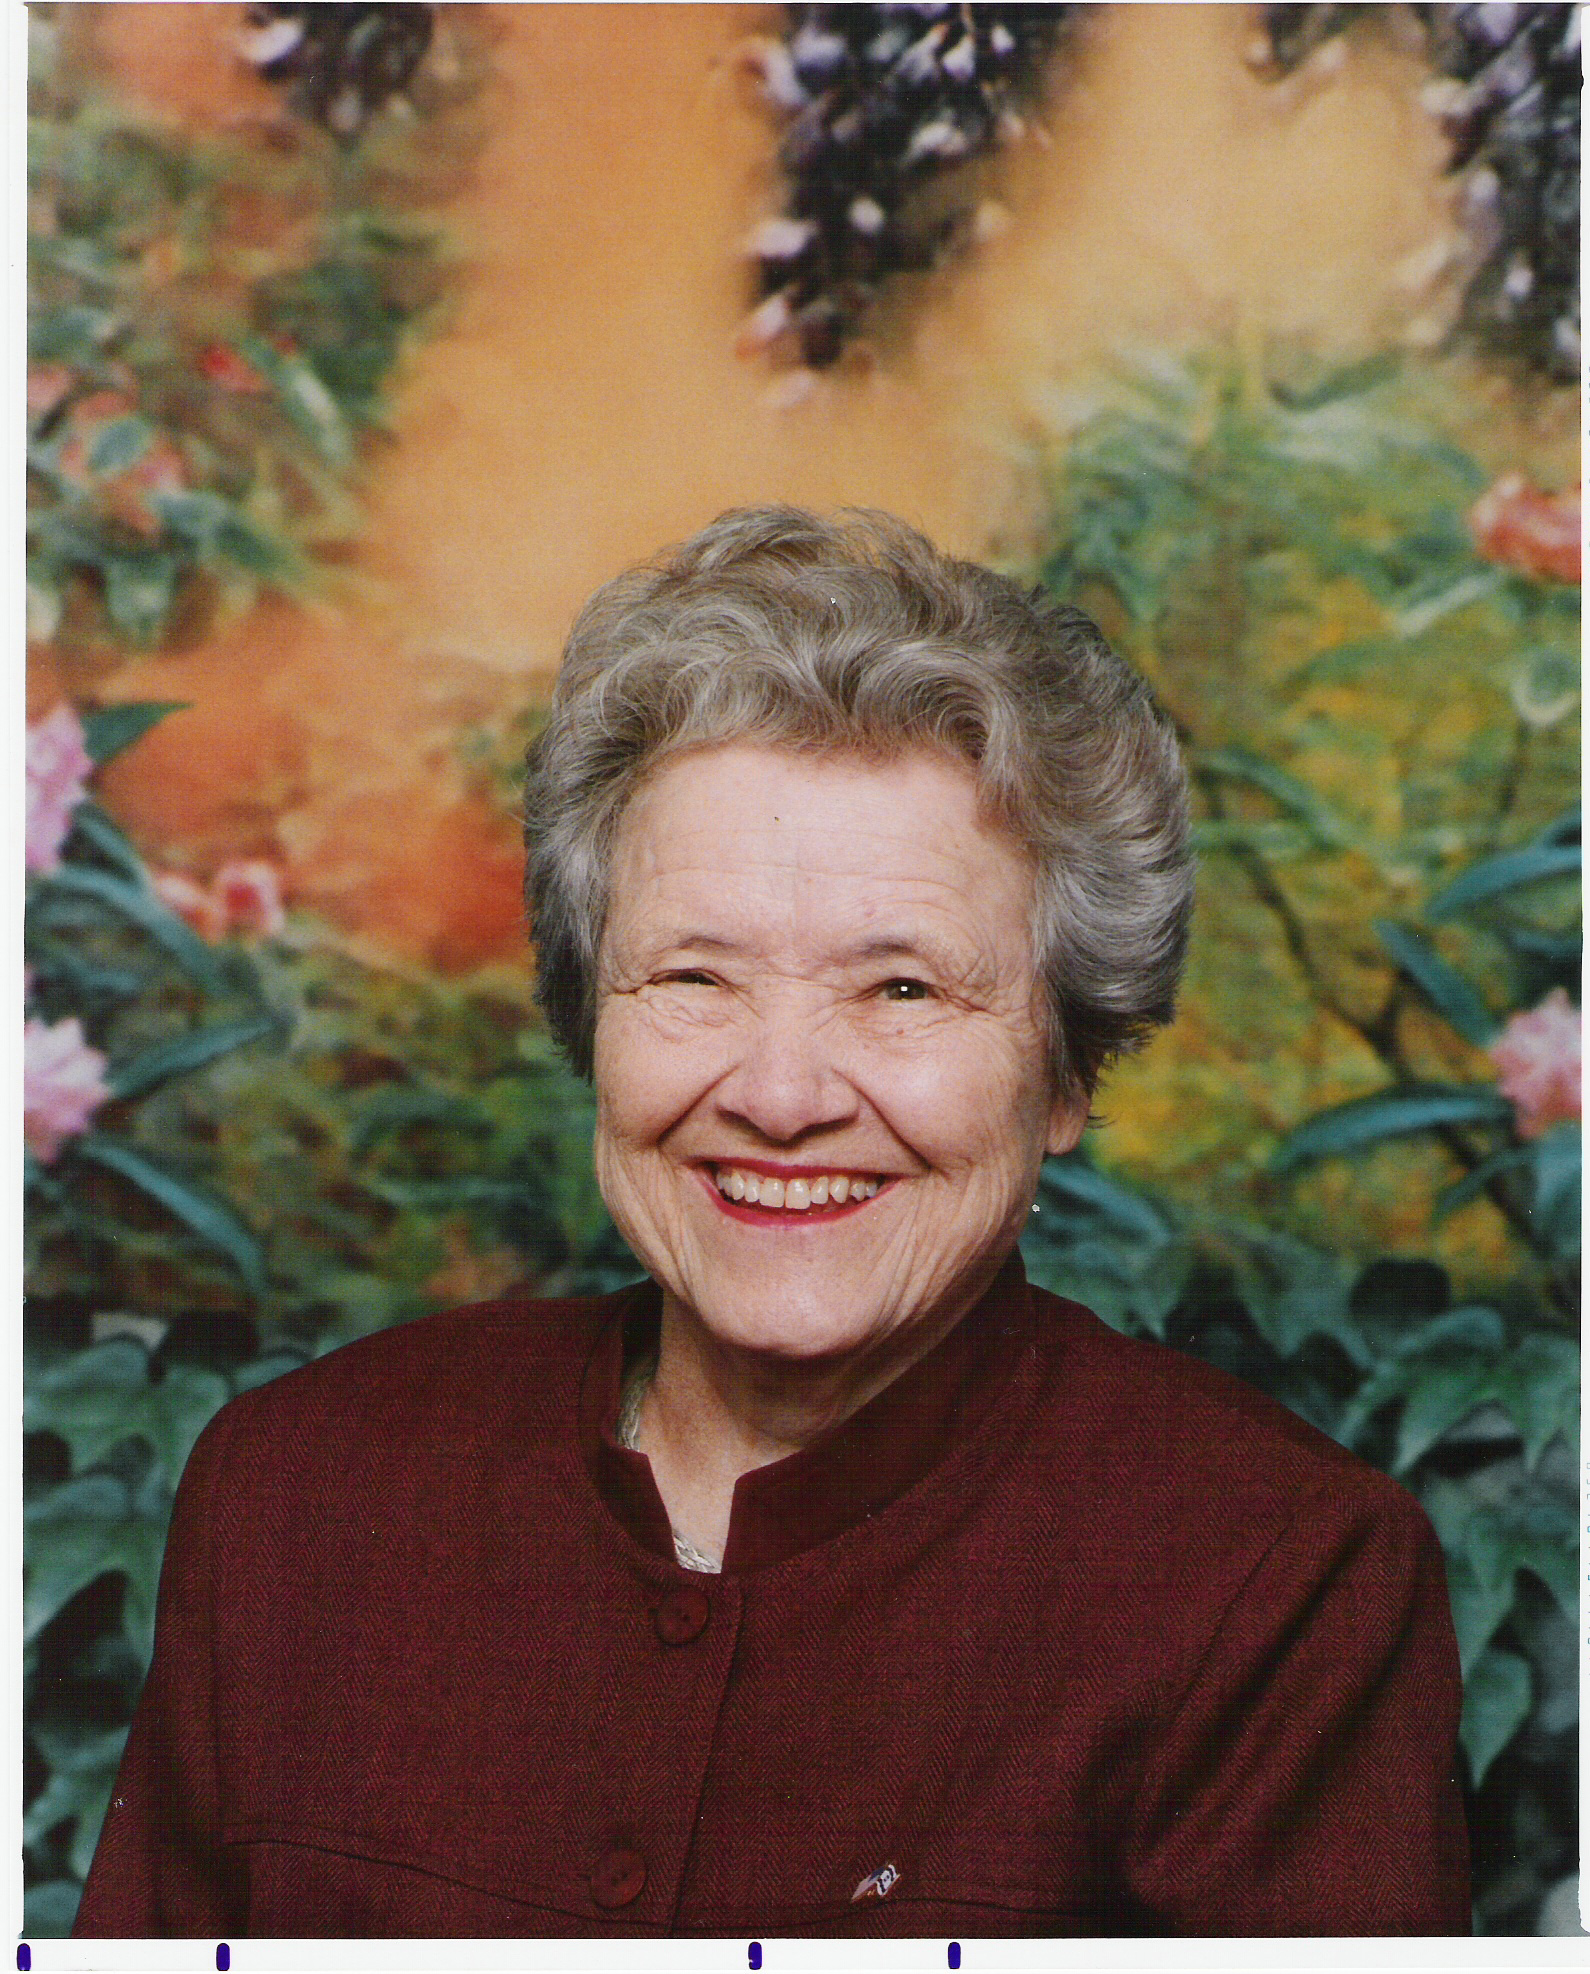 Eloise Beckstrom